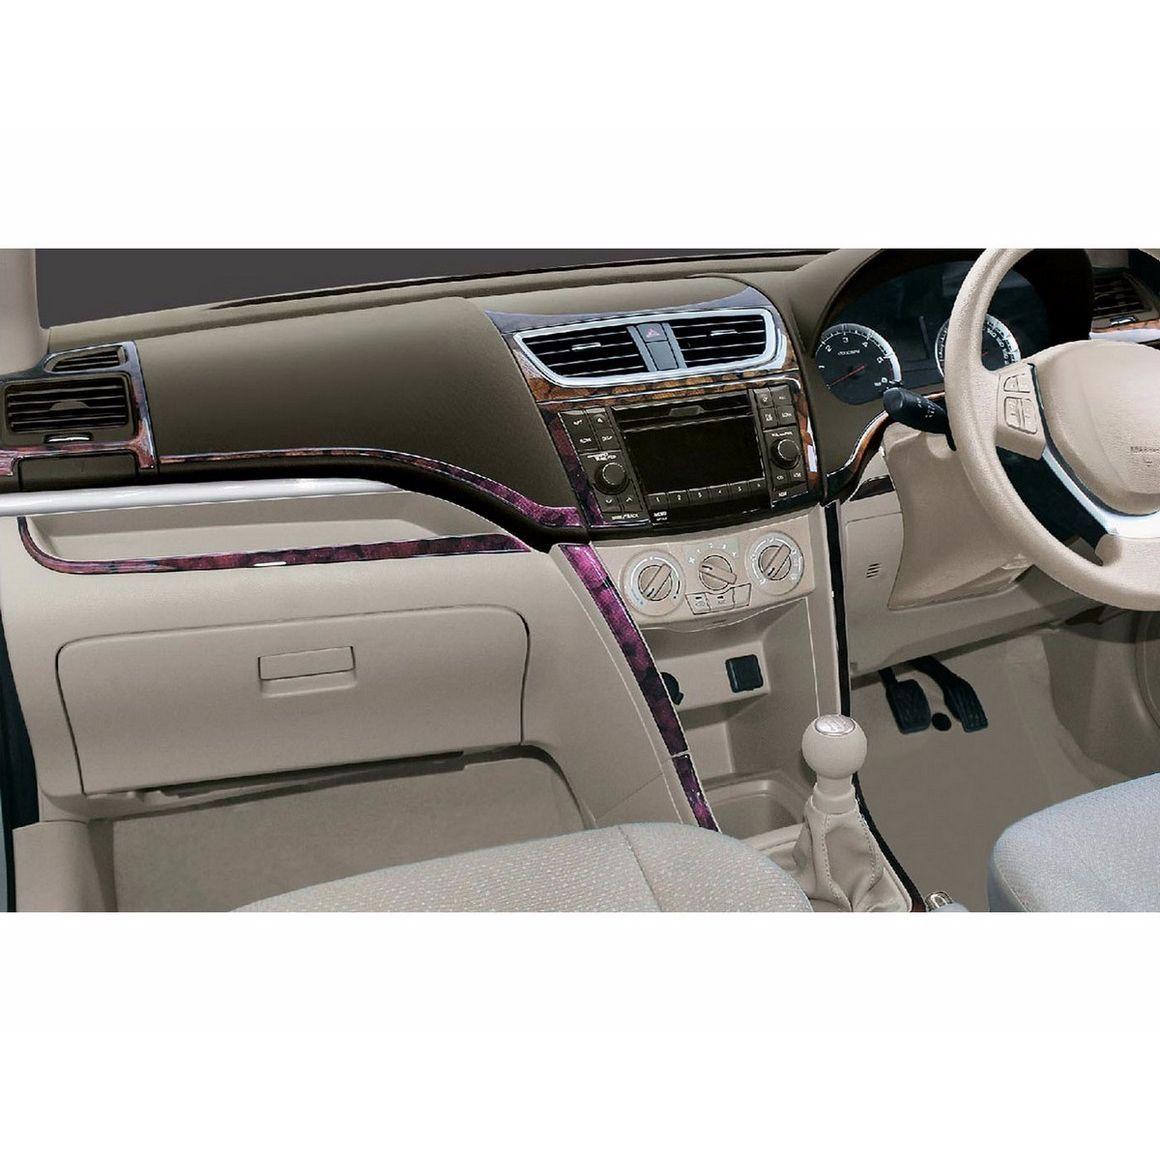 Autographix B Kit Mr Dashboard Trim For M S Dzr Gear Stick Steering Wheel Protection [ 1160 x 1160 Pixel ]